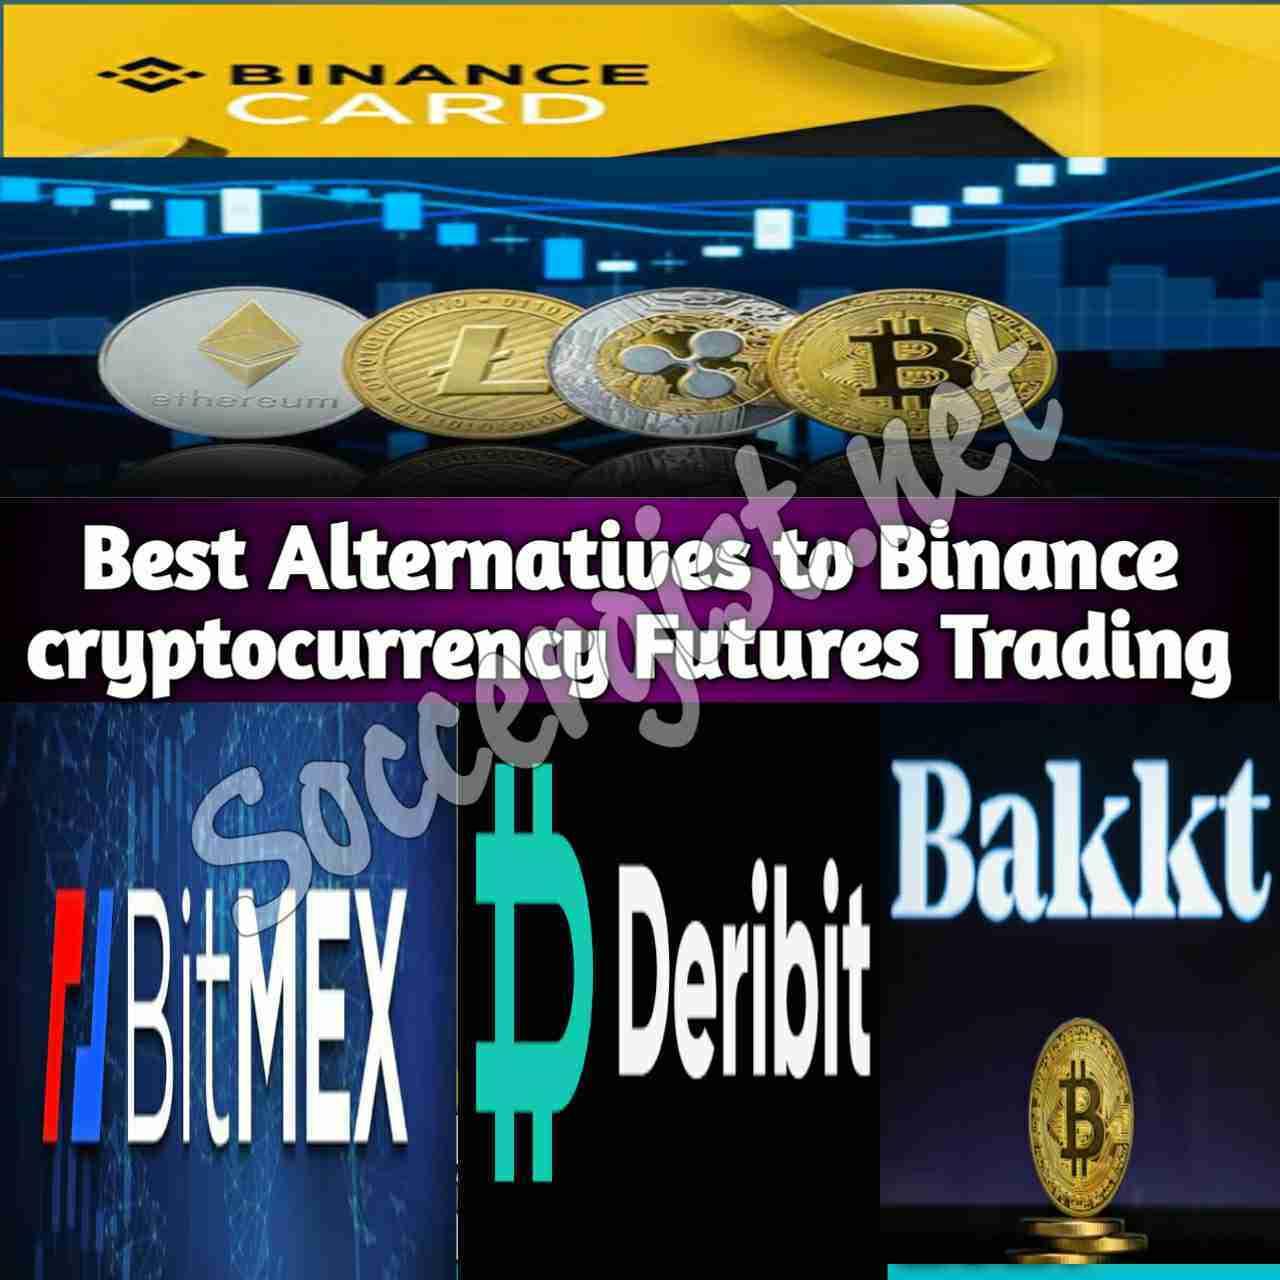 binance-cryptocurrency-futures-trading-alternative